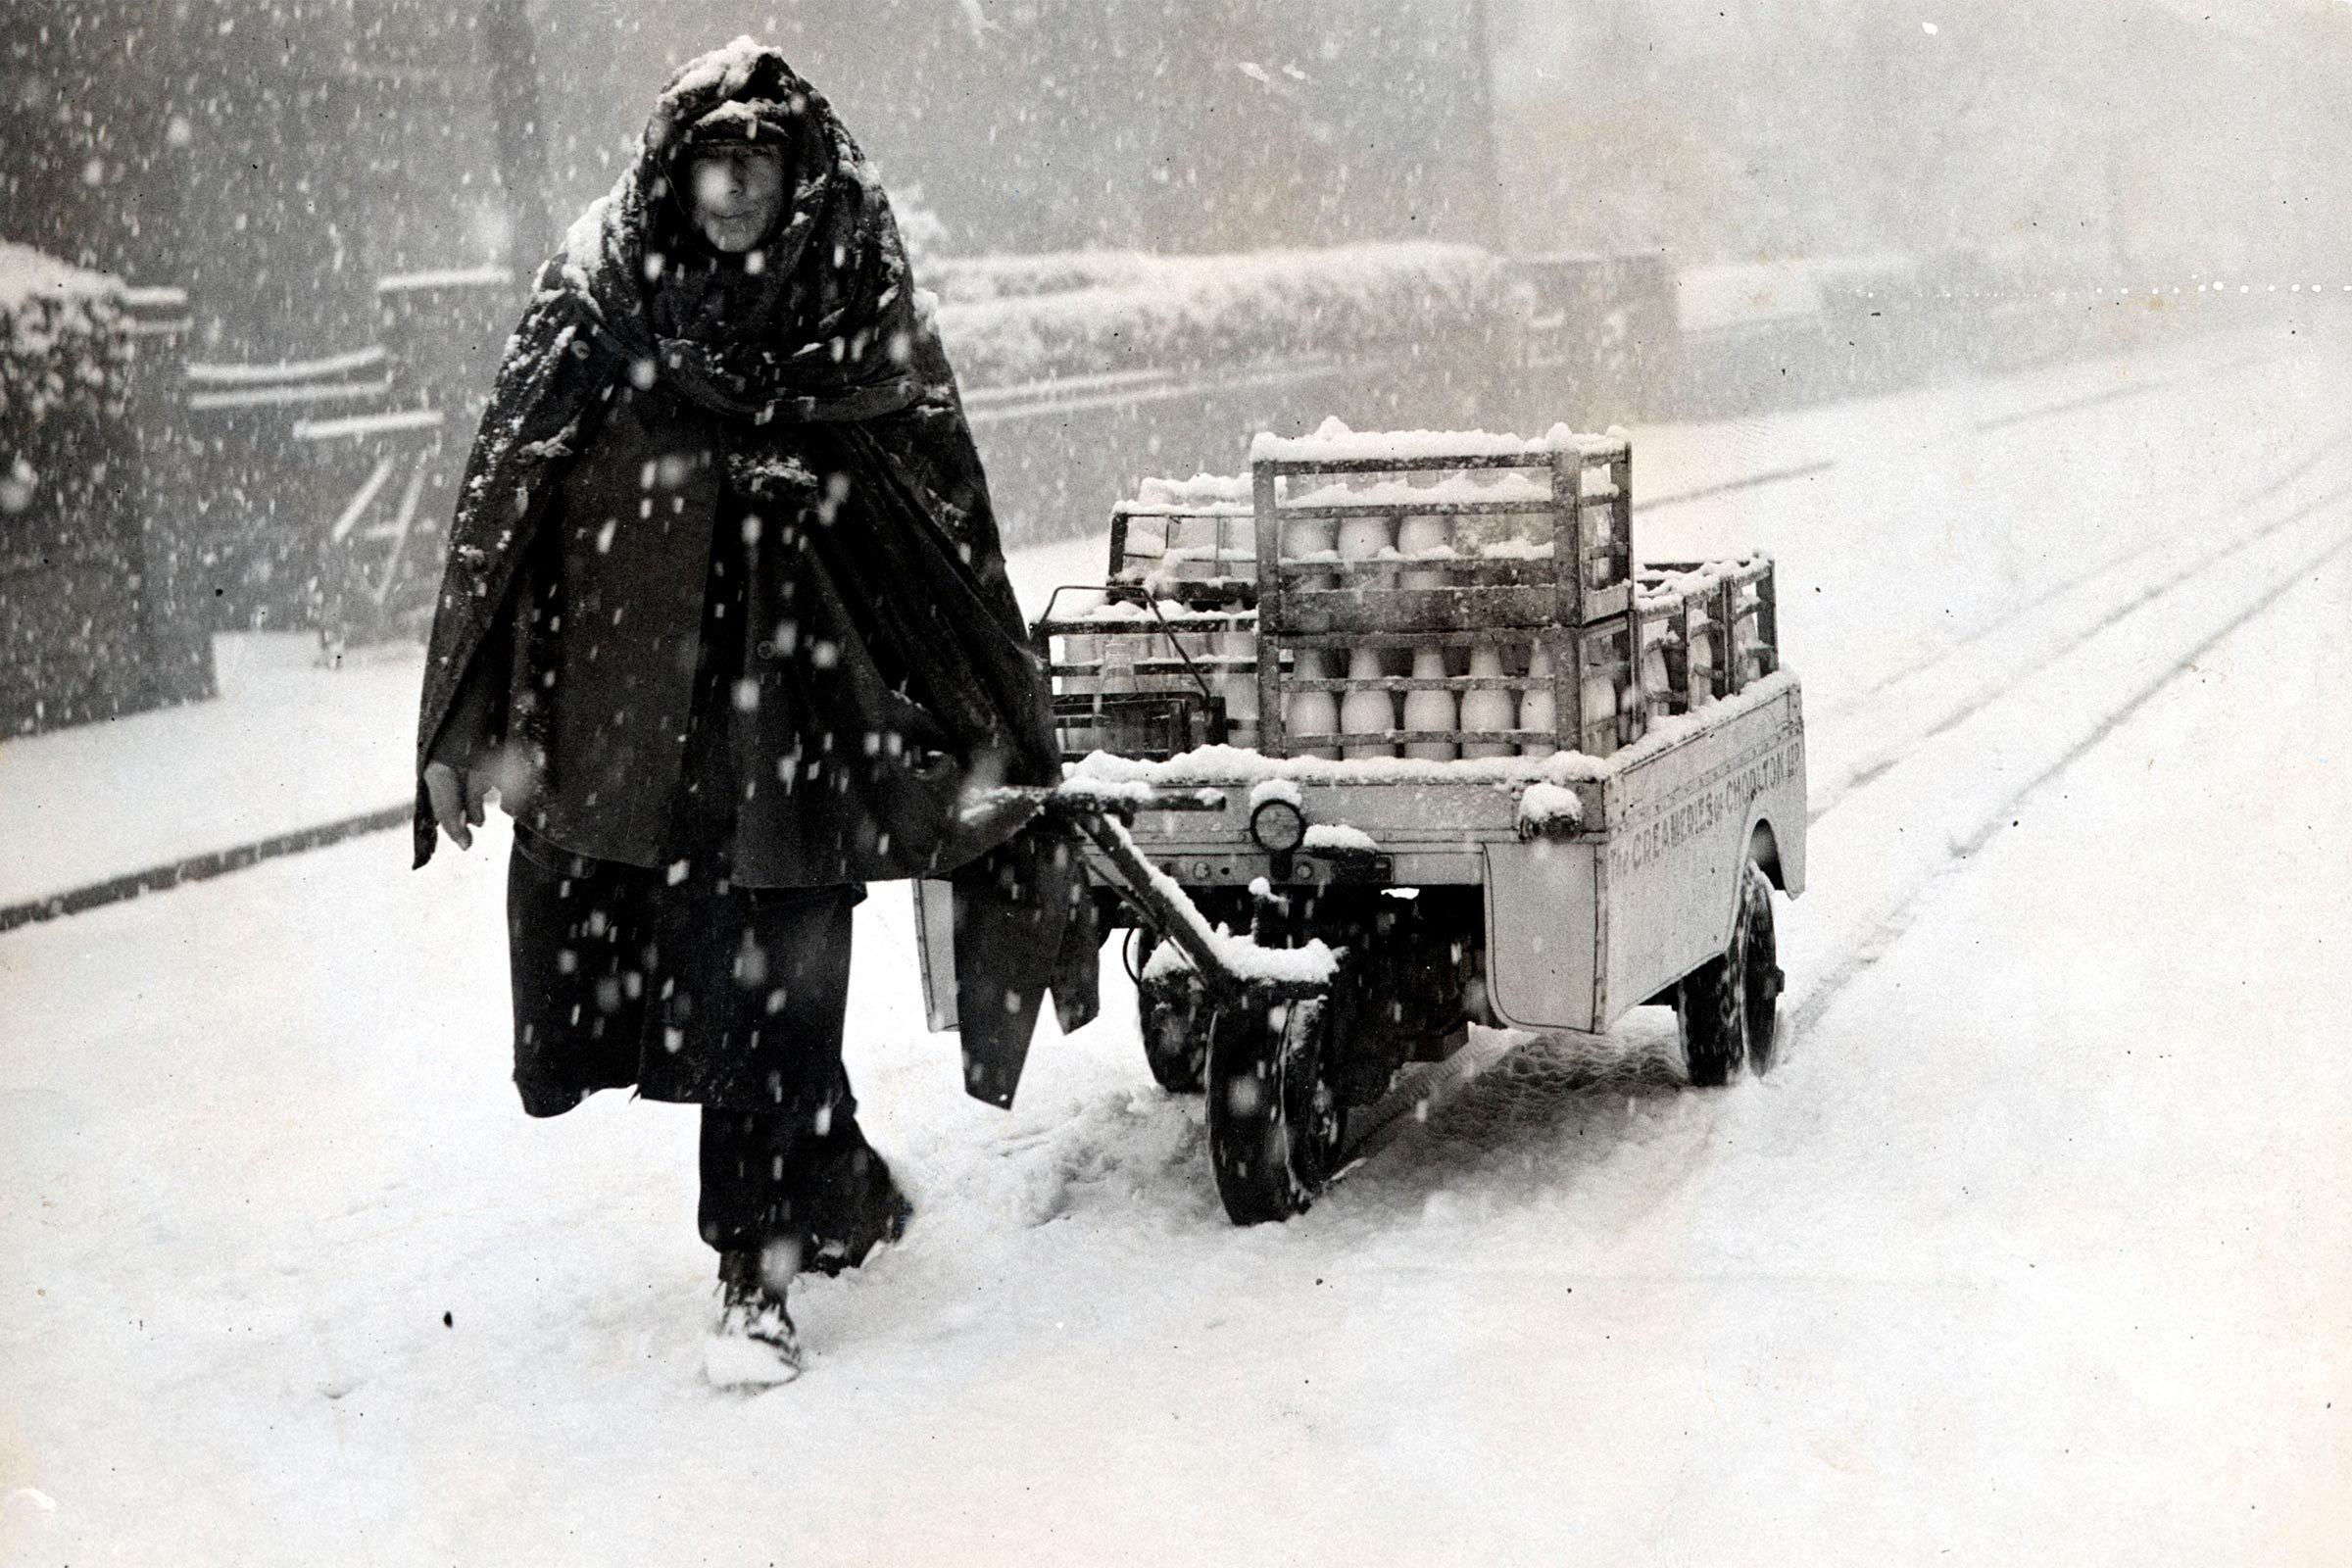 Milkman in snow